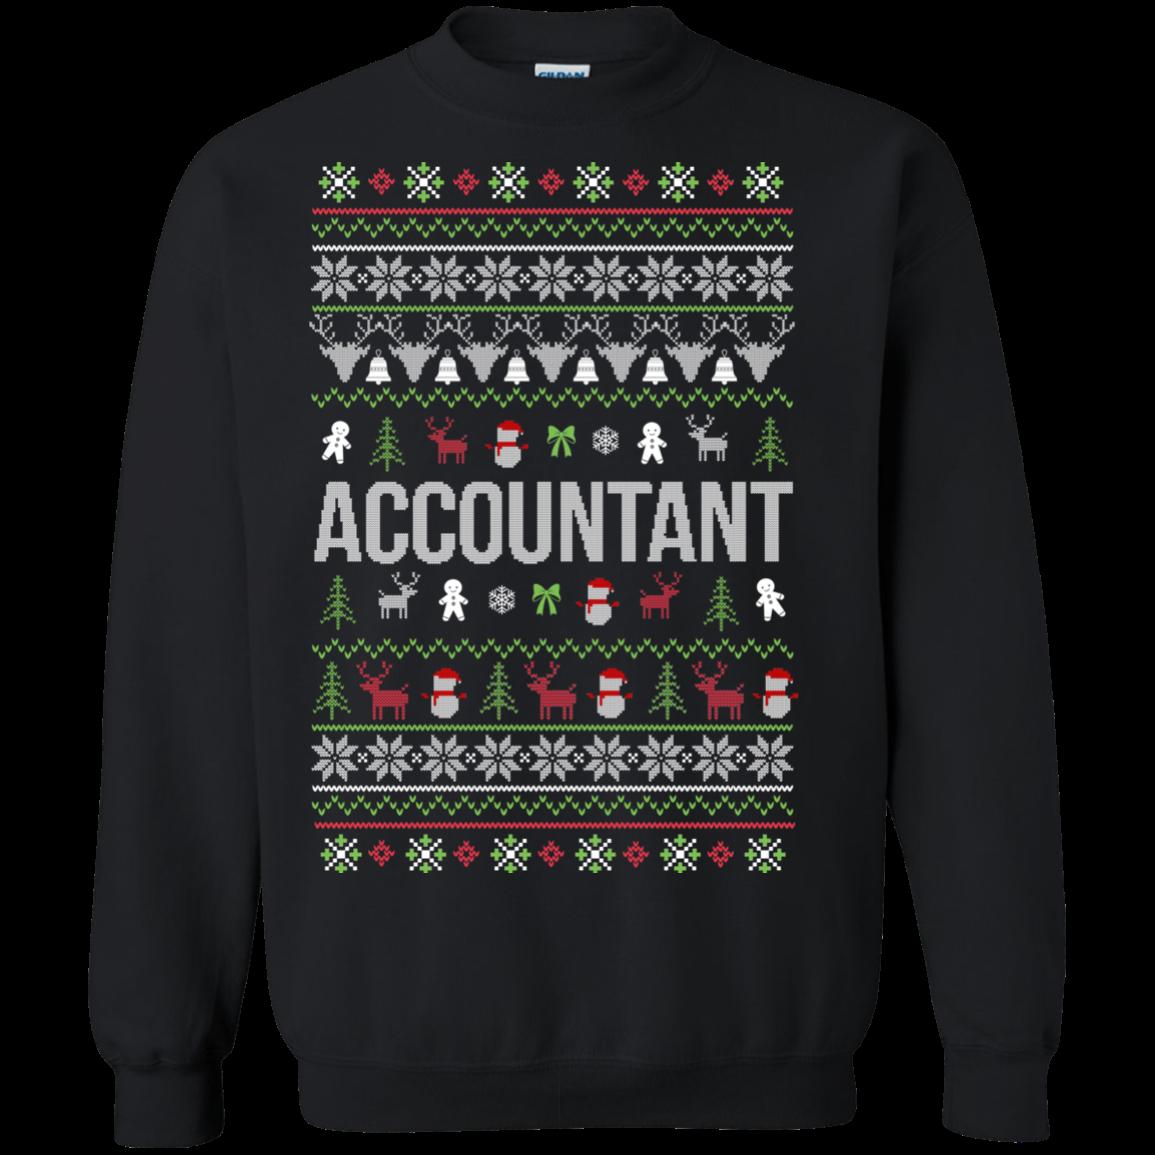 Accountant Ugly Christmas Sweaters Merry Christmas S S Shirts